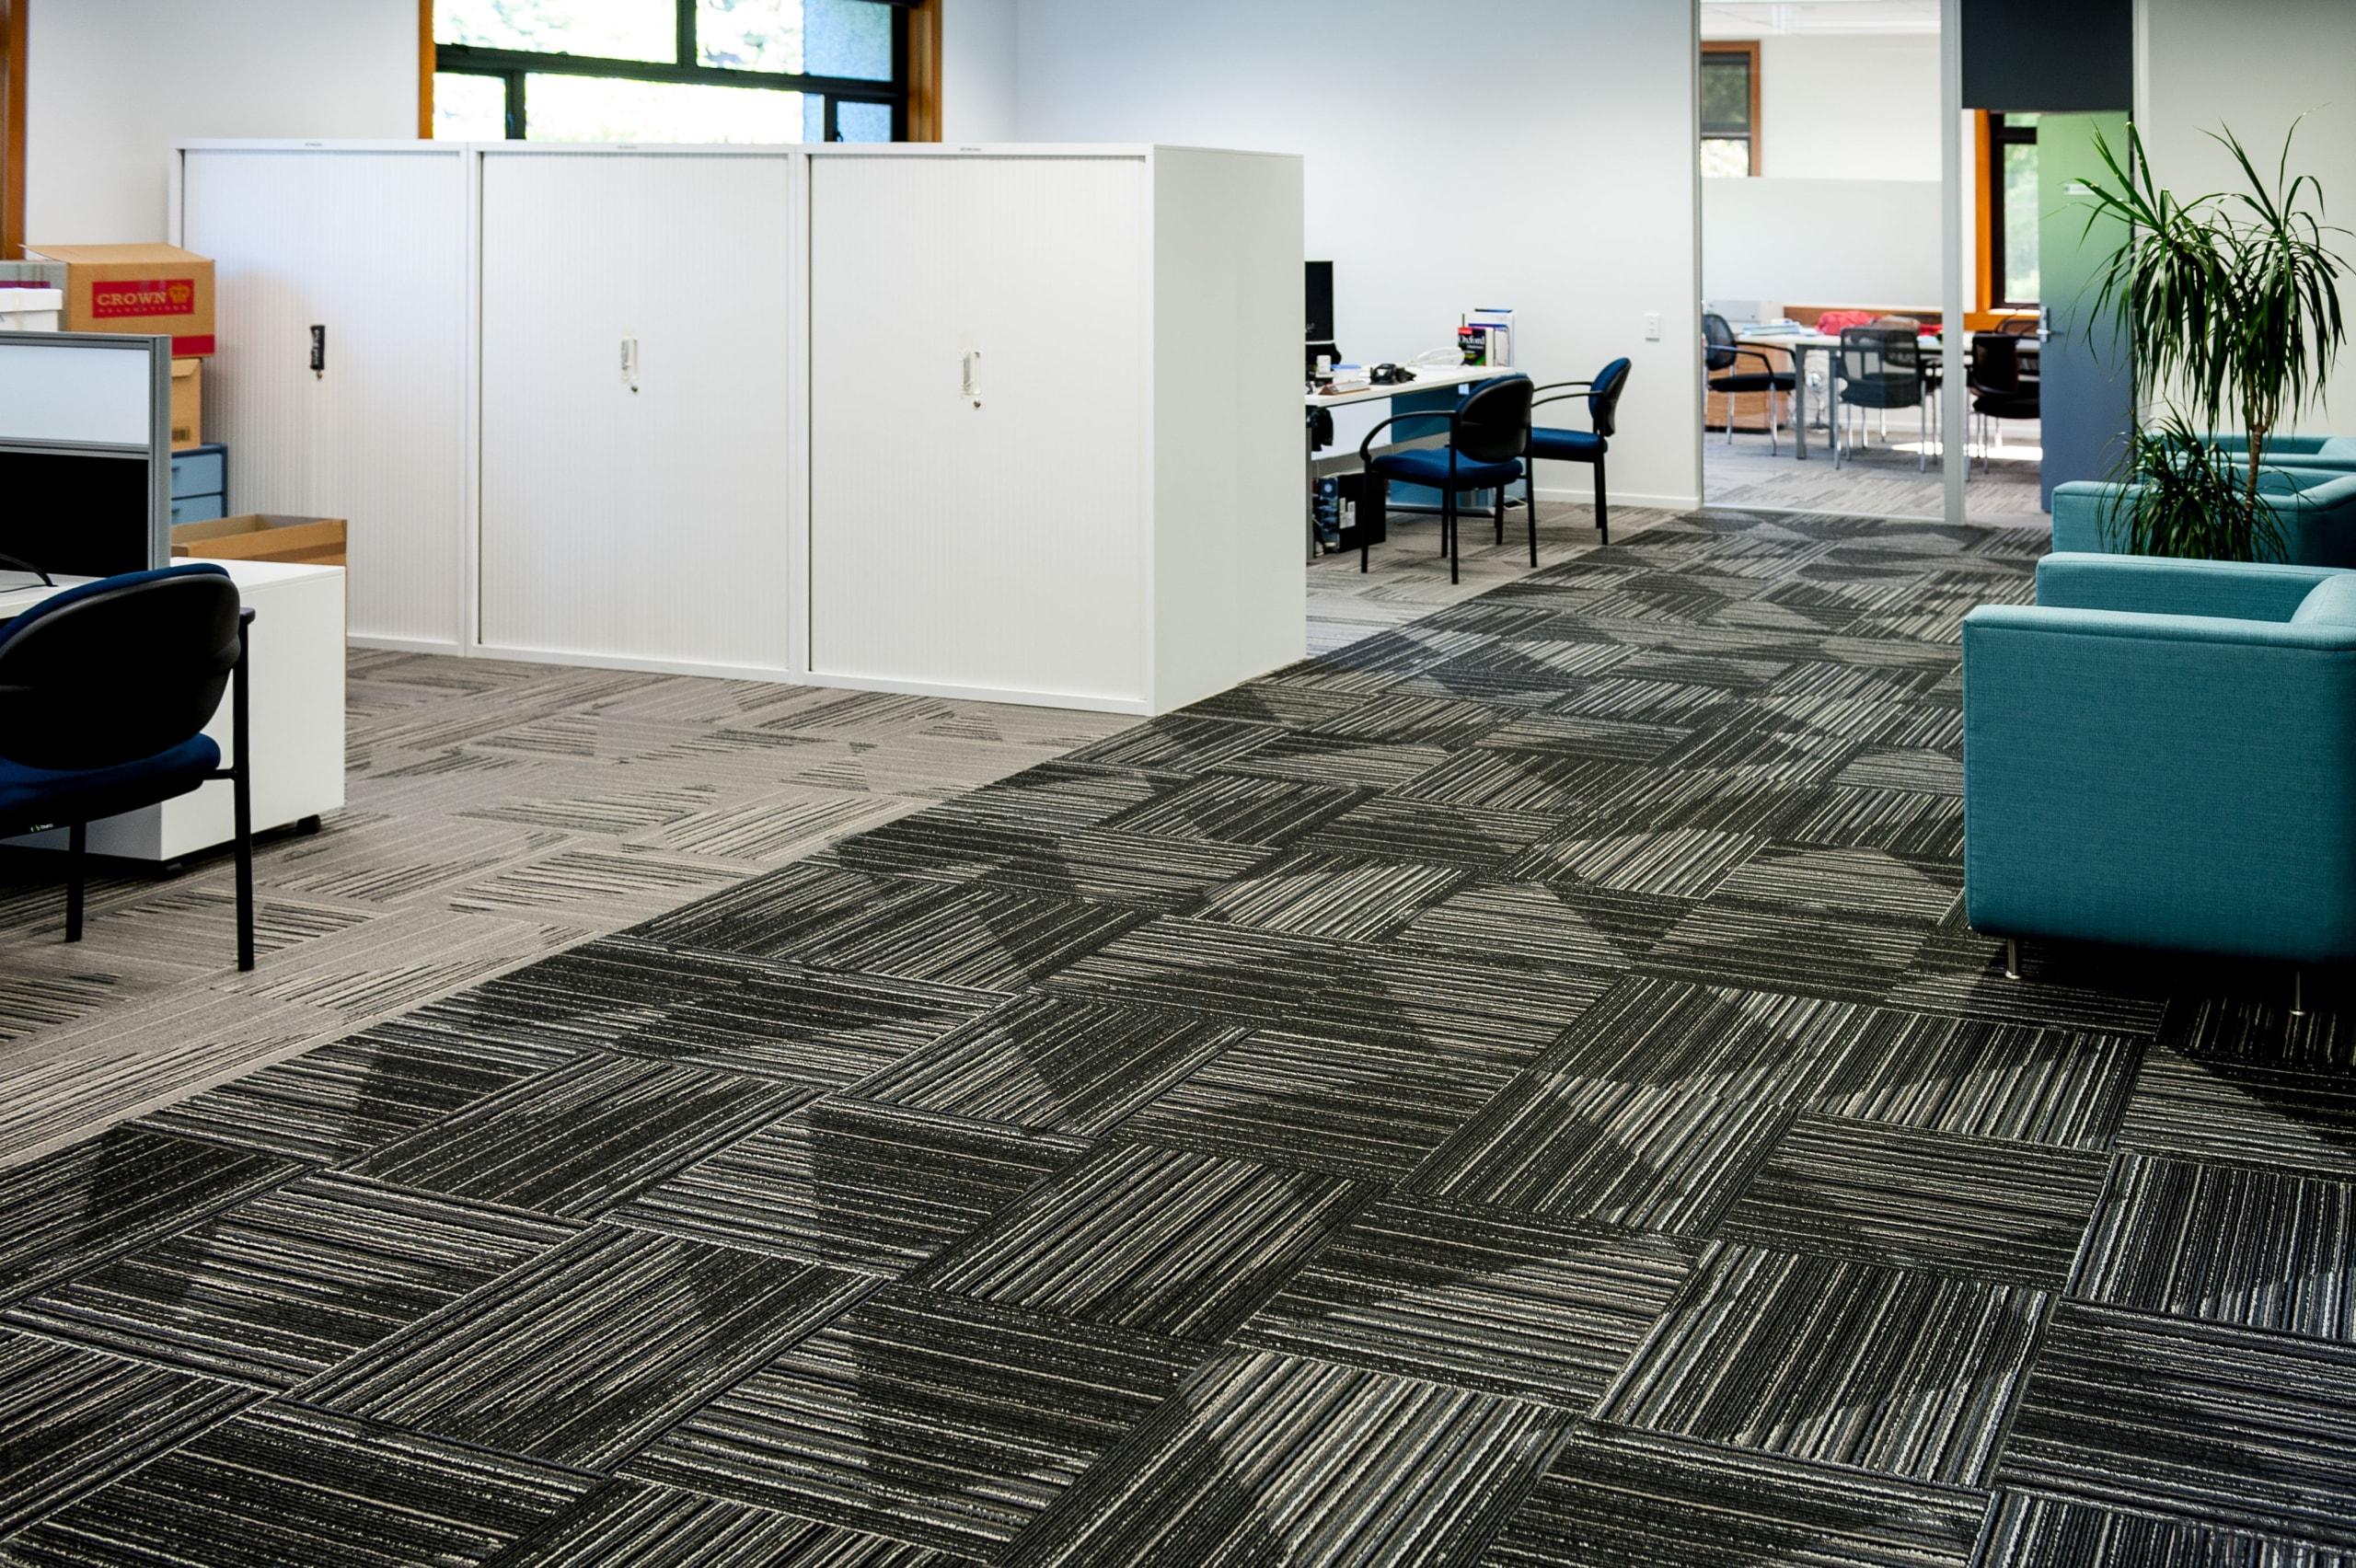 Durable, good-looking carpet tiles for commercial use carpet, floor, flooring, hardwood, interior design, laminate flooring, tile, wood, wood flooring, black, white